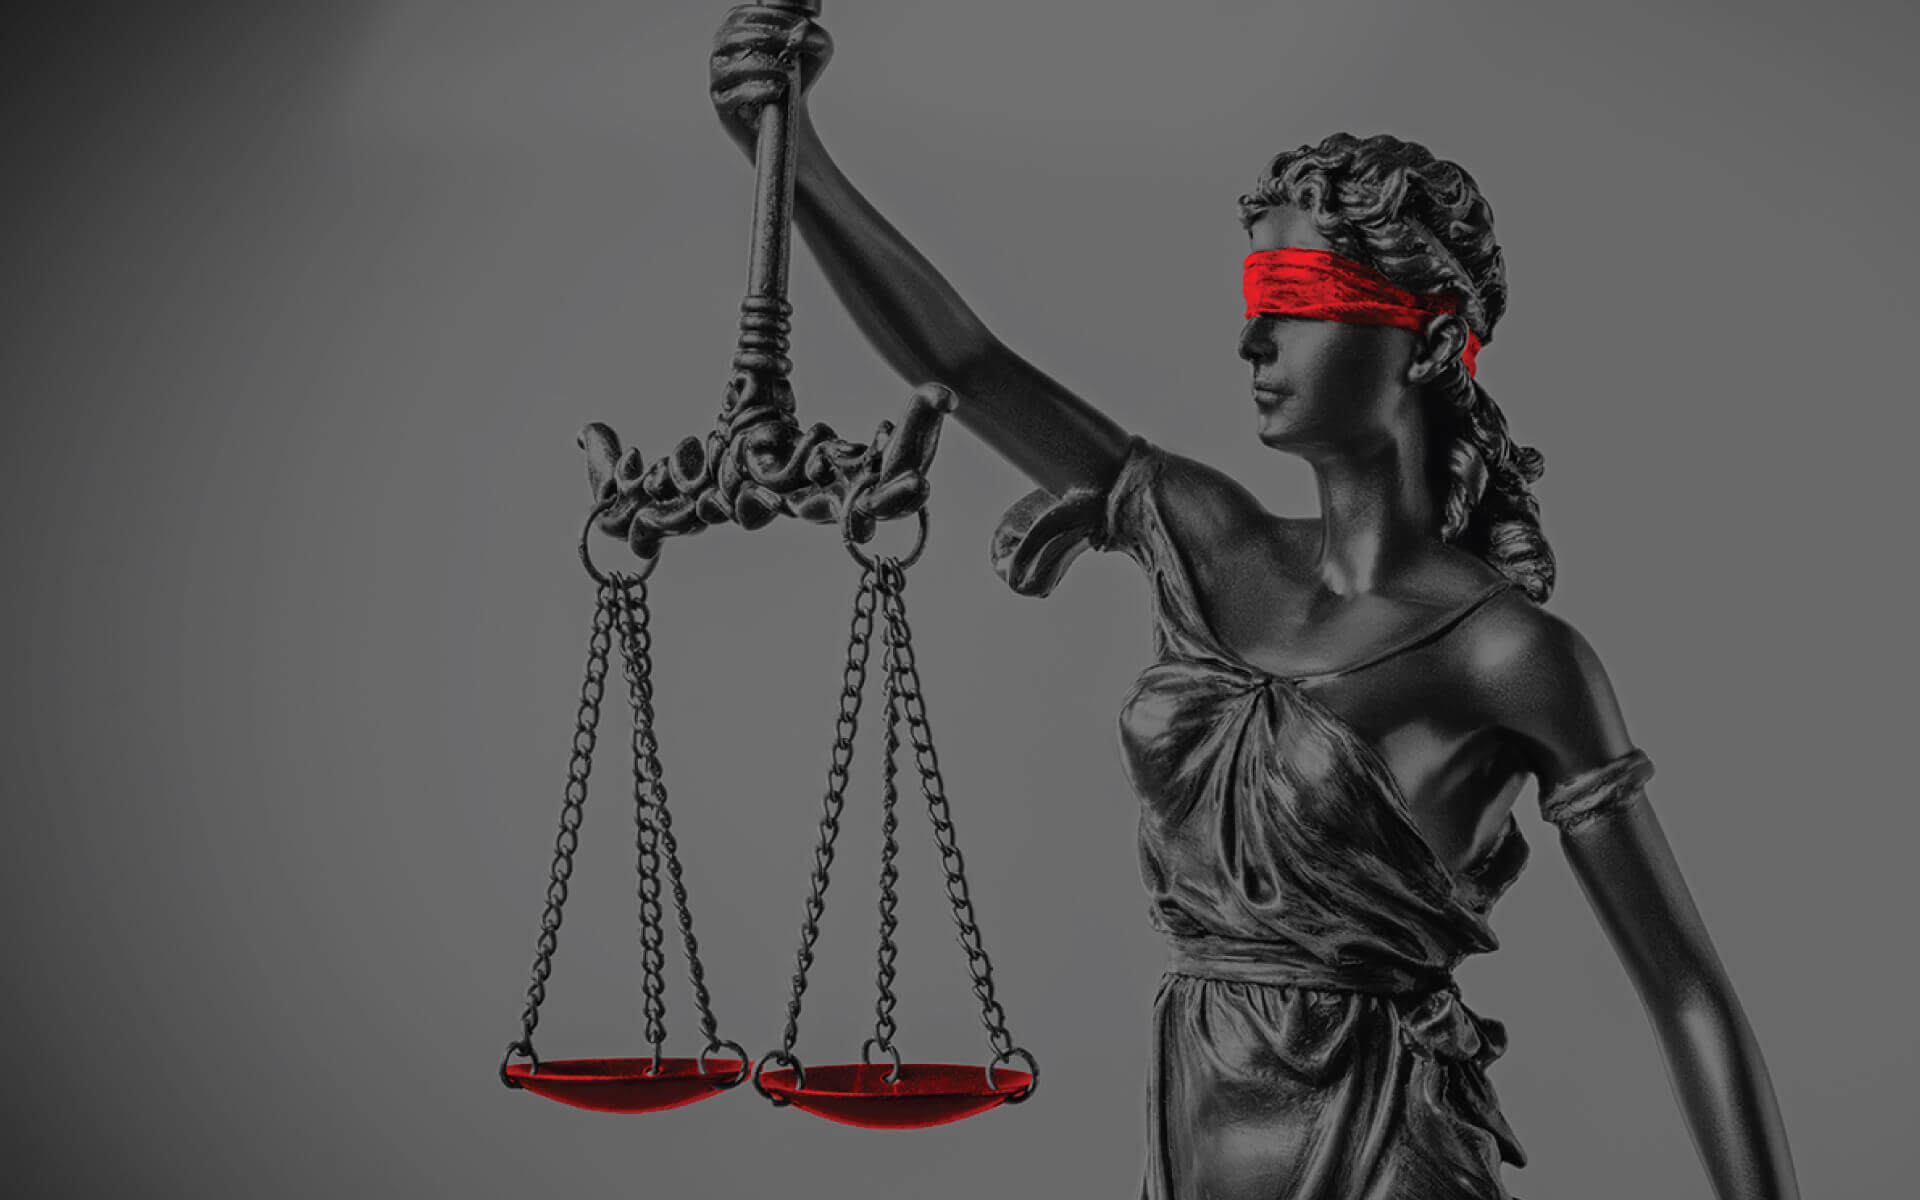 Debbie Irwin Voiceovers Medical Legal Bg